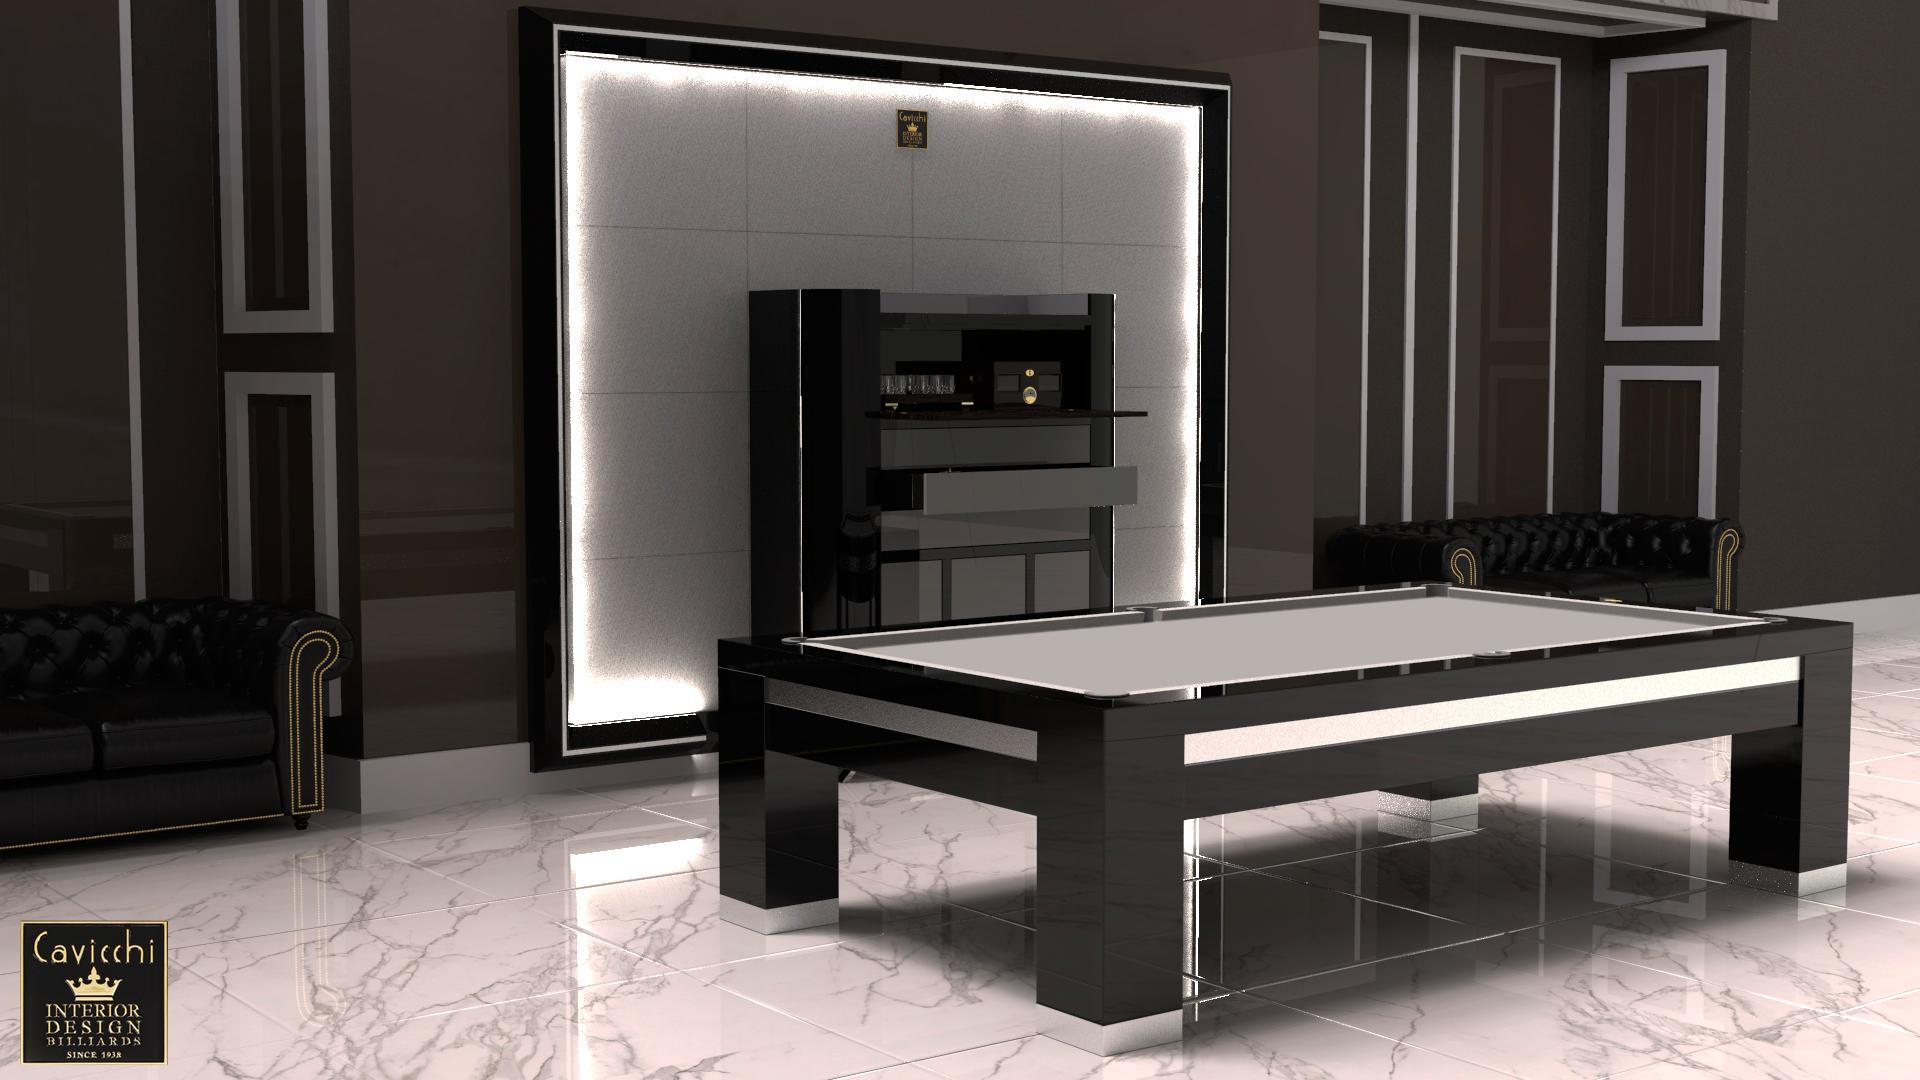 Biliardo Cayman - Showroom Shop 1